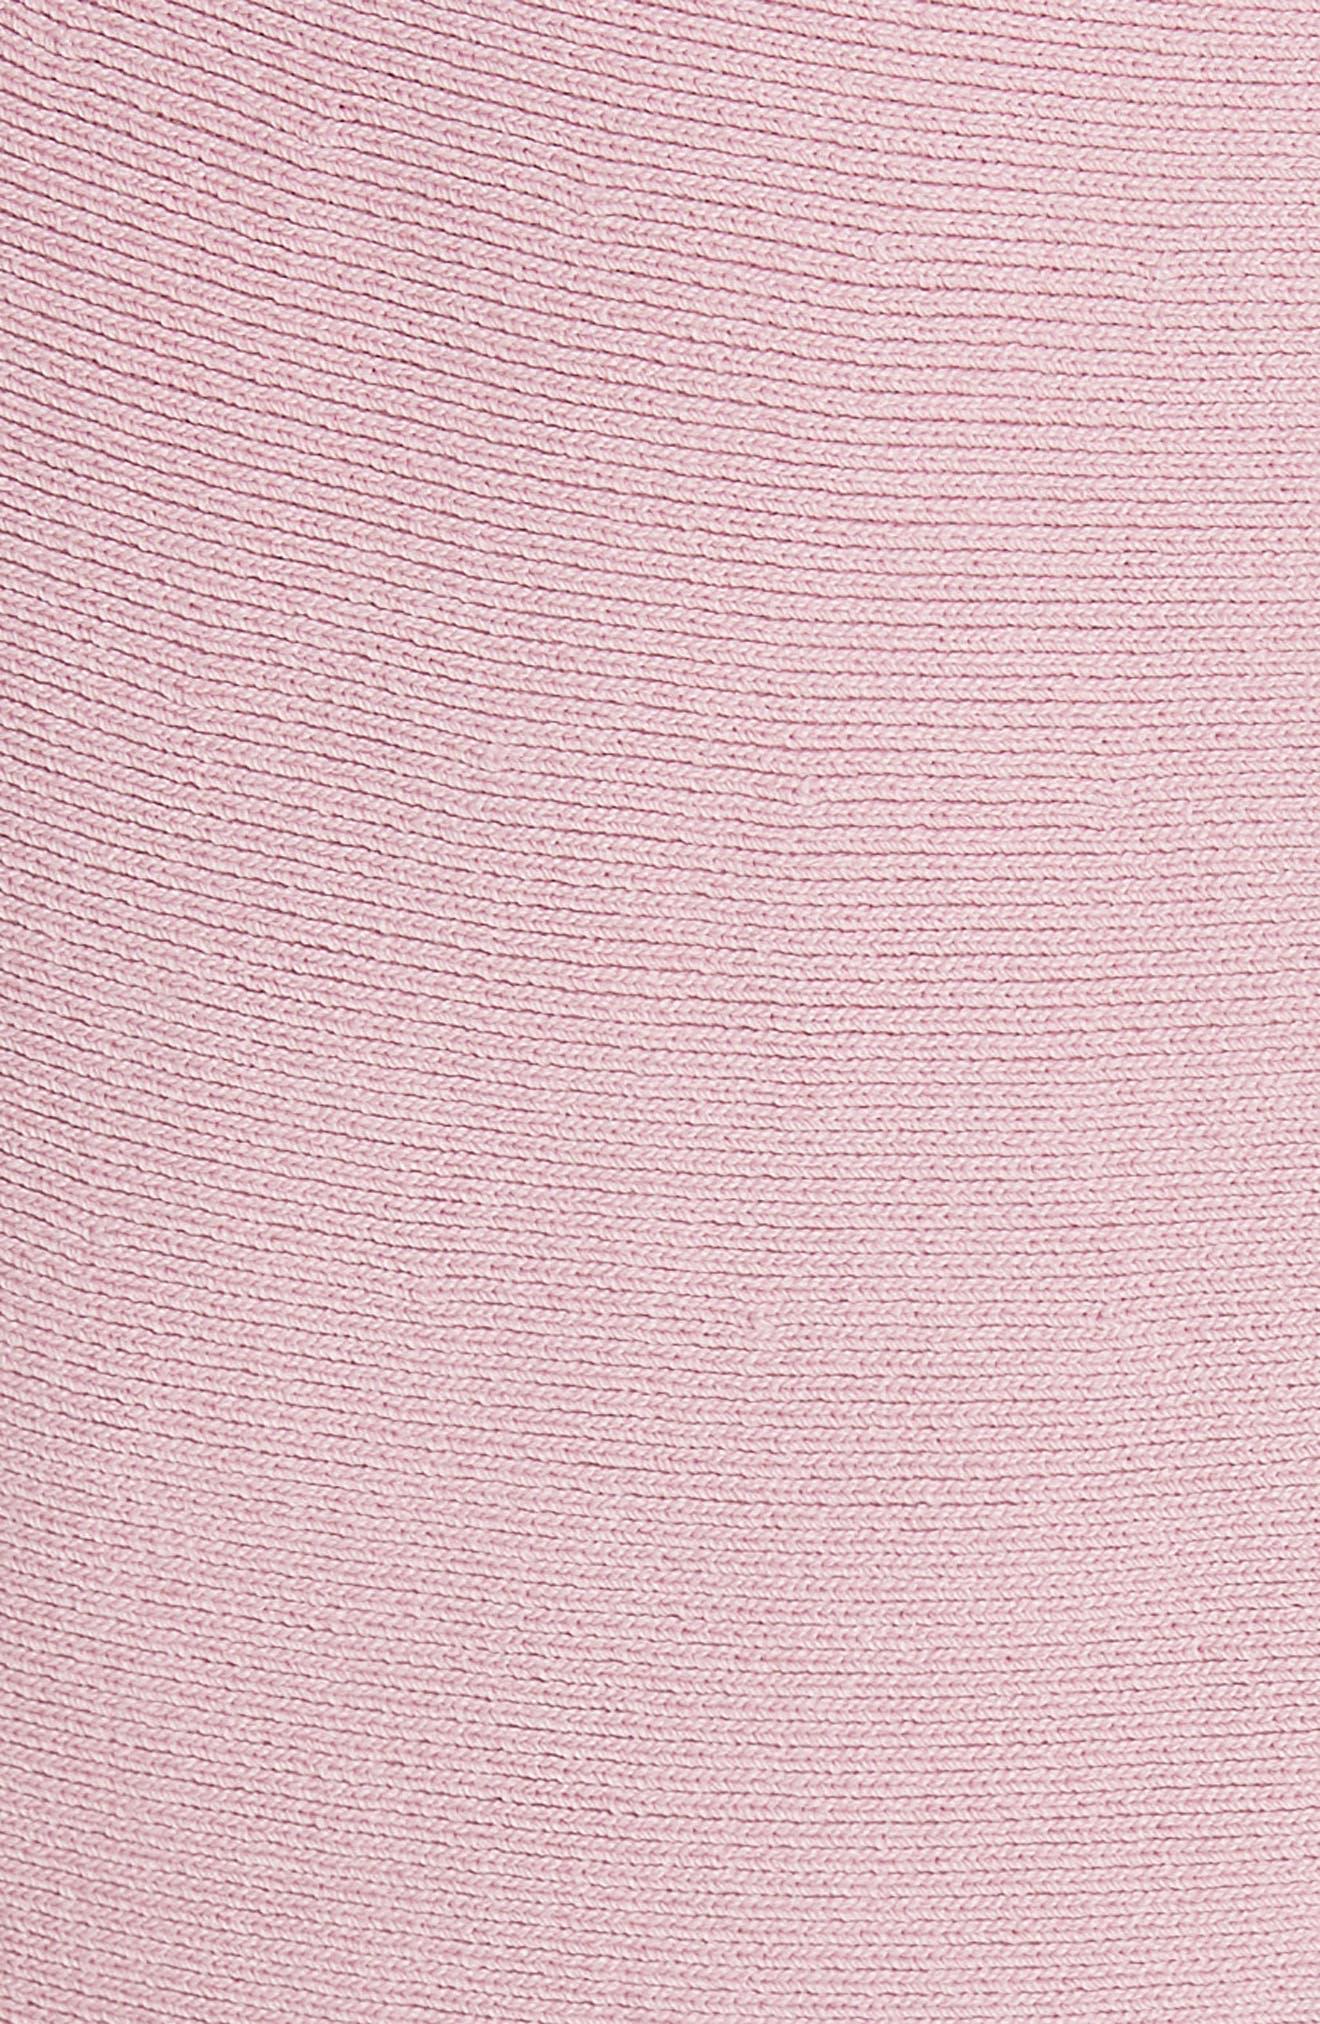 Bow Detail Knit Fit & Flare Dress,                             Alternate thumbnail 6, color,